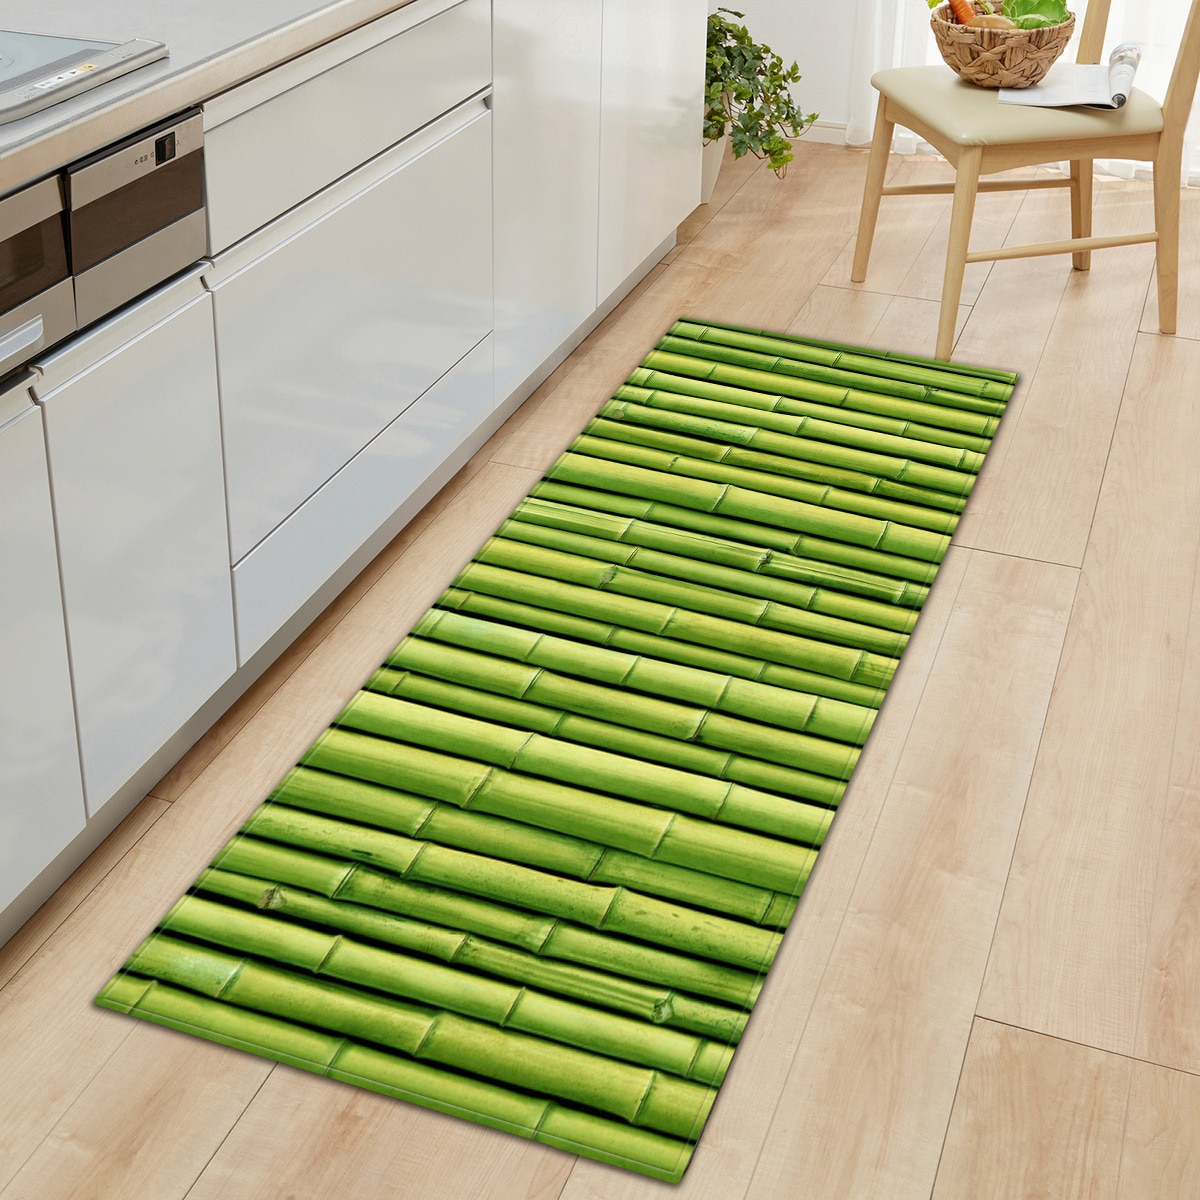 3D Printed Long Carpet Non-slip Absorbent Bathroom Kitchen Mat Sofa Wardrobe Shoe Cabinet Floor Mat Picnic Rug